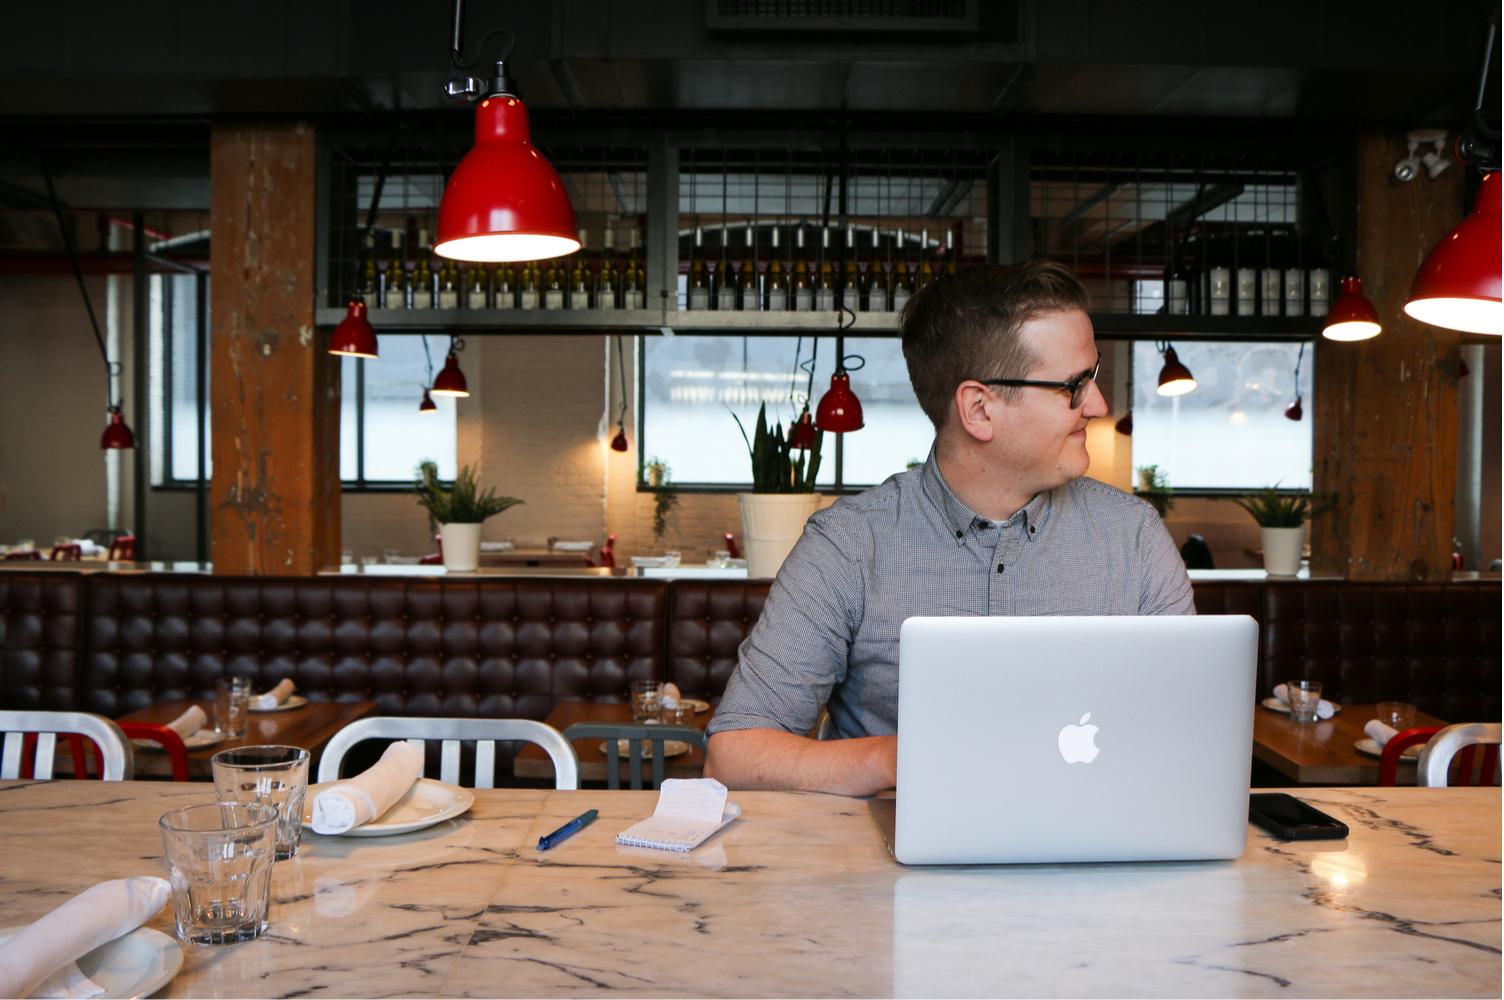 7 Creative Digital Marketing Ideas for Restaurants